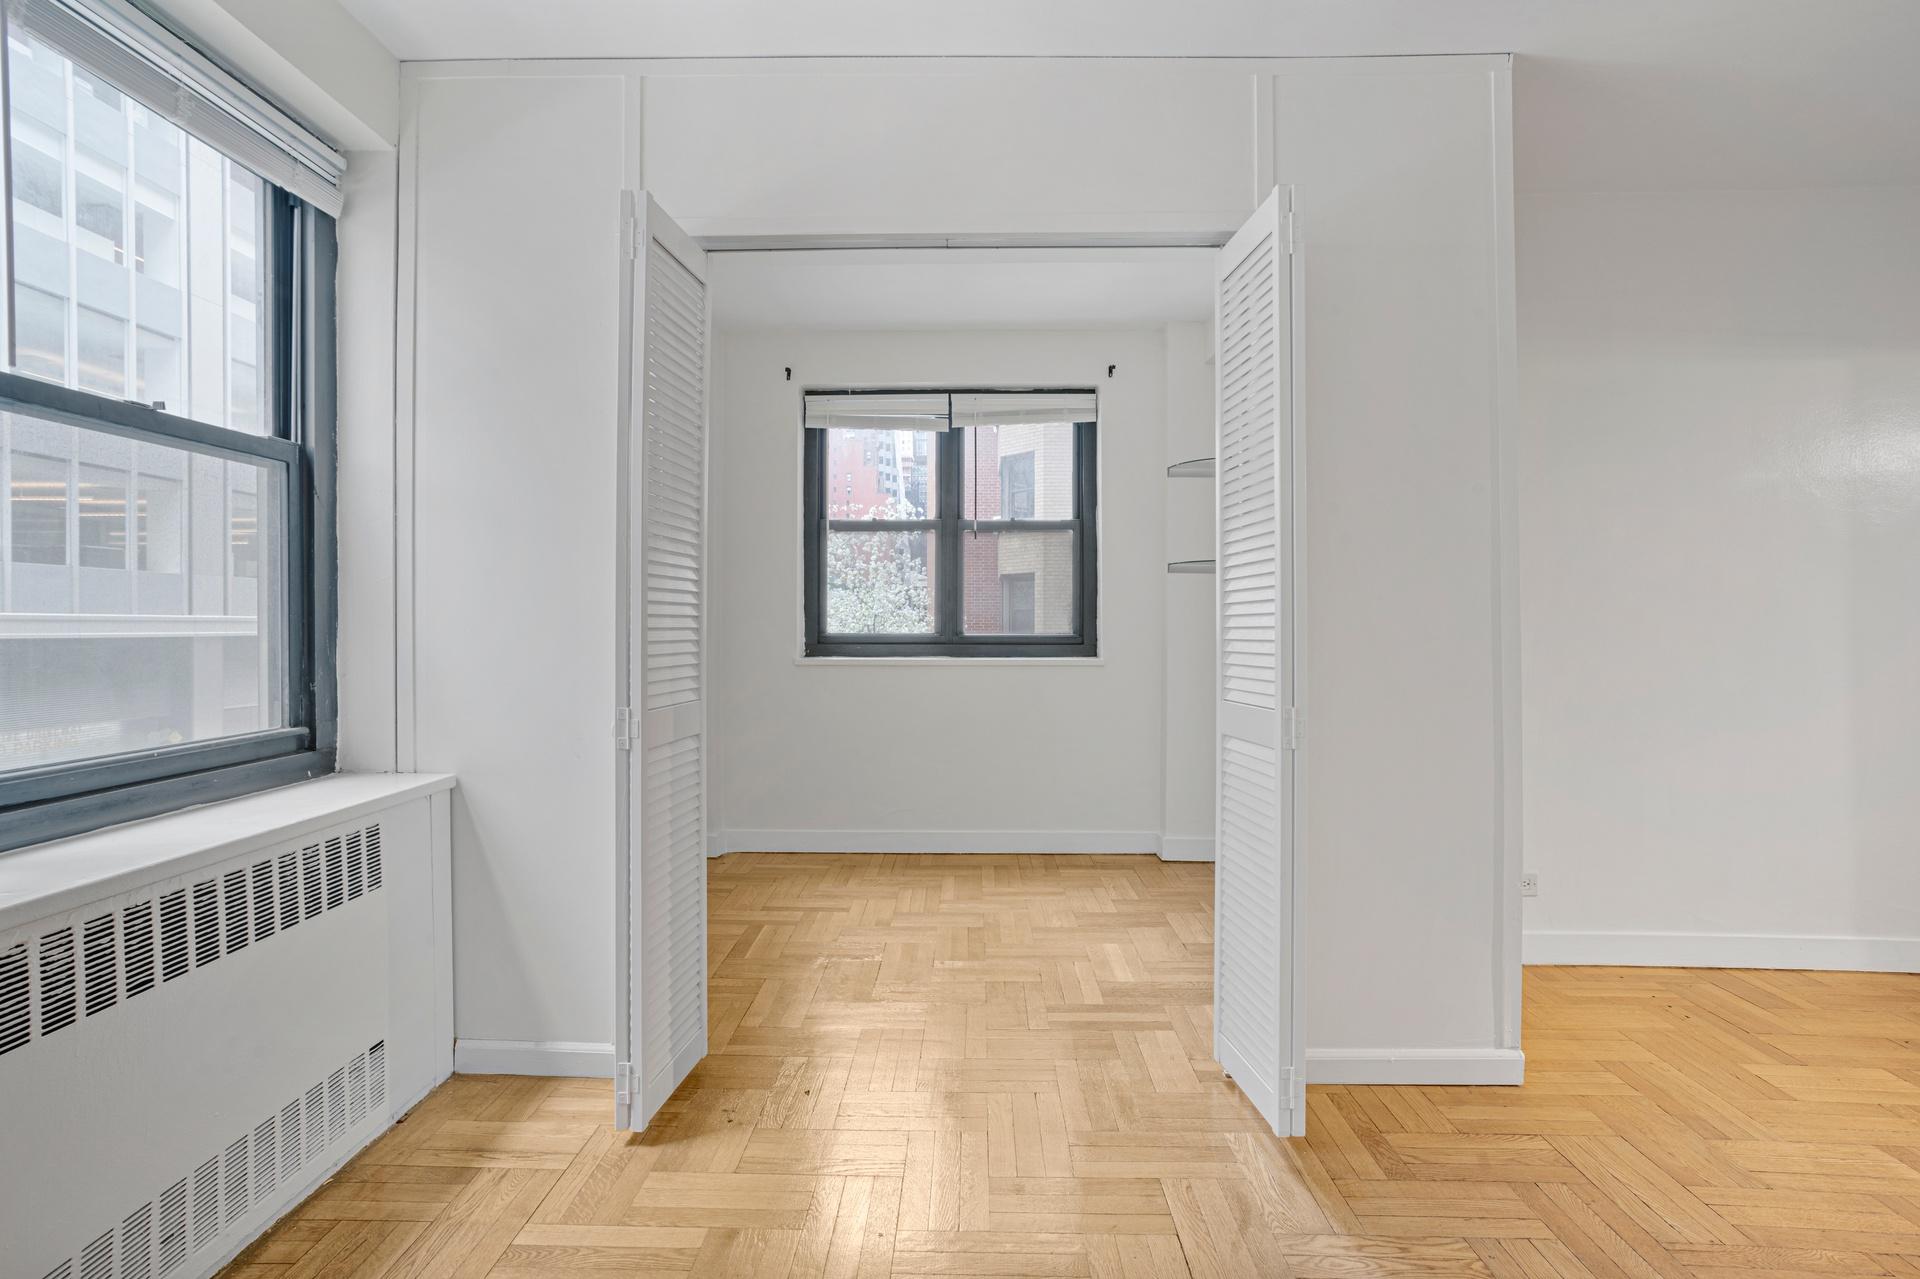 135 East 54th Street Midtown East New York NY 10022